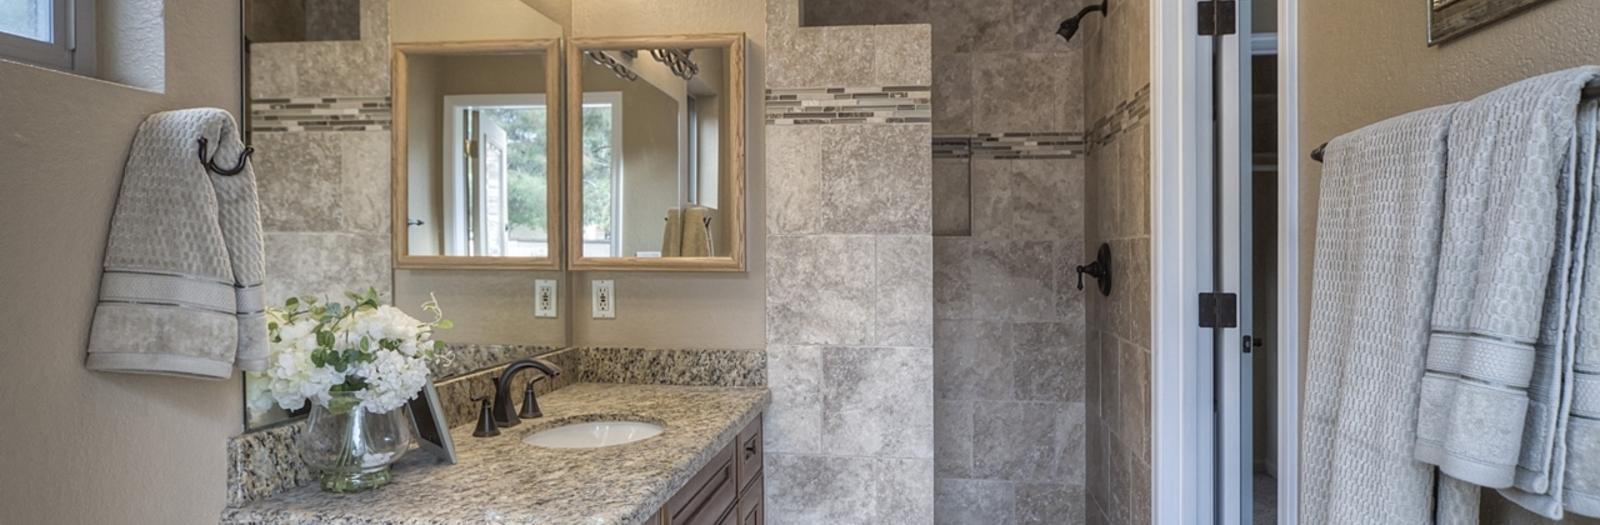 Kitchen Cabinet Refacing Miami Fl